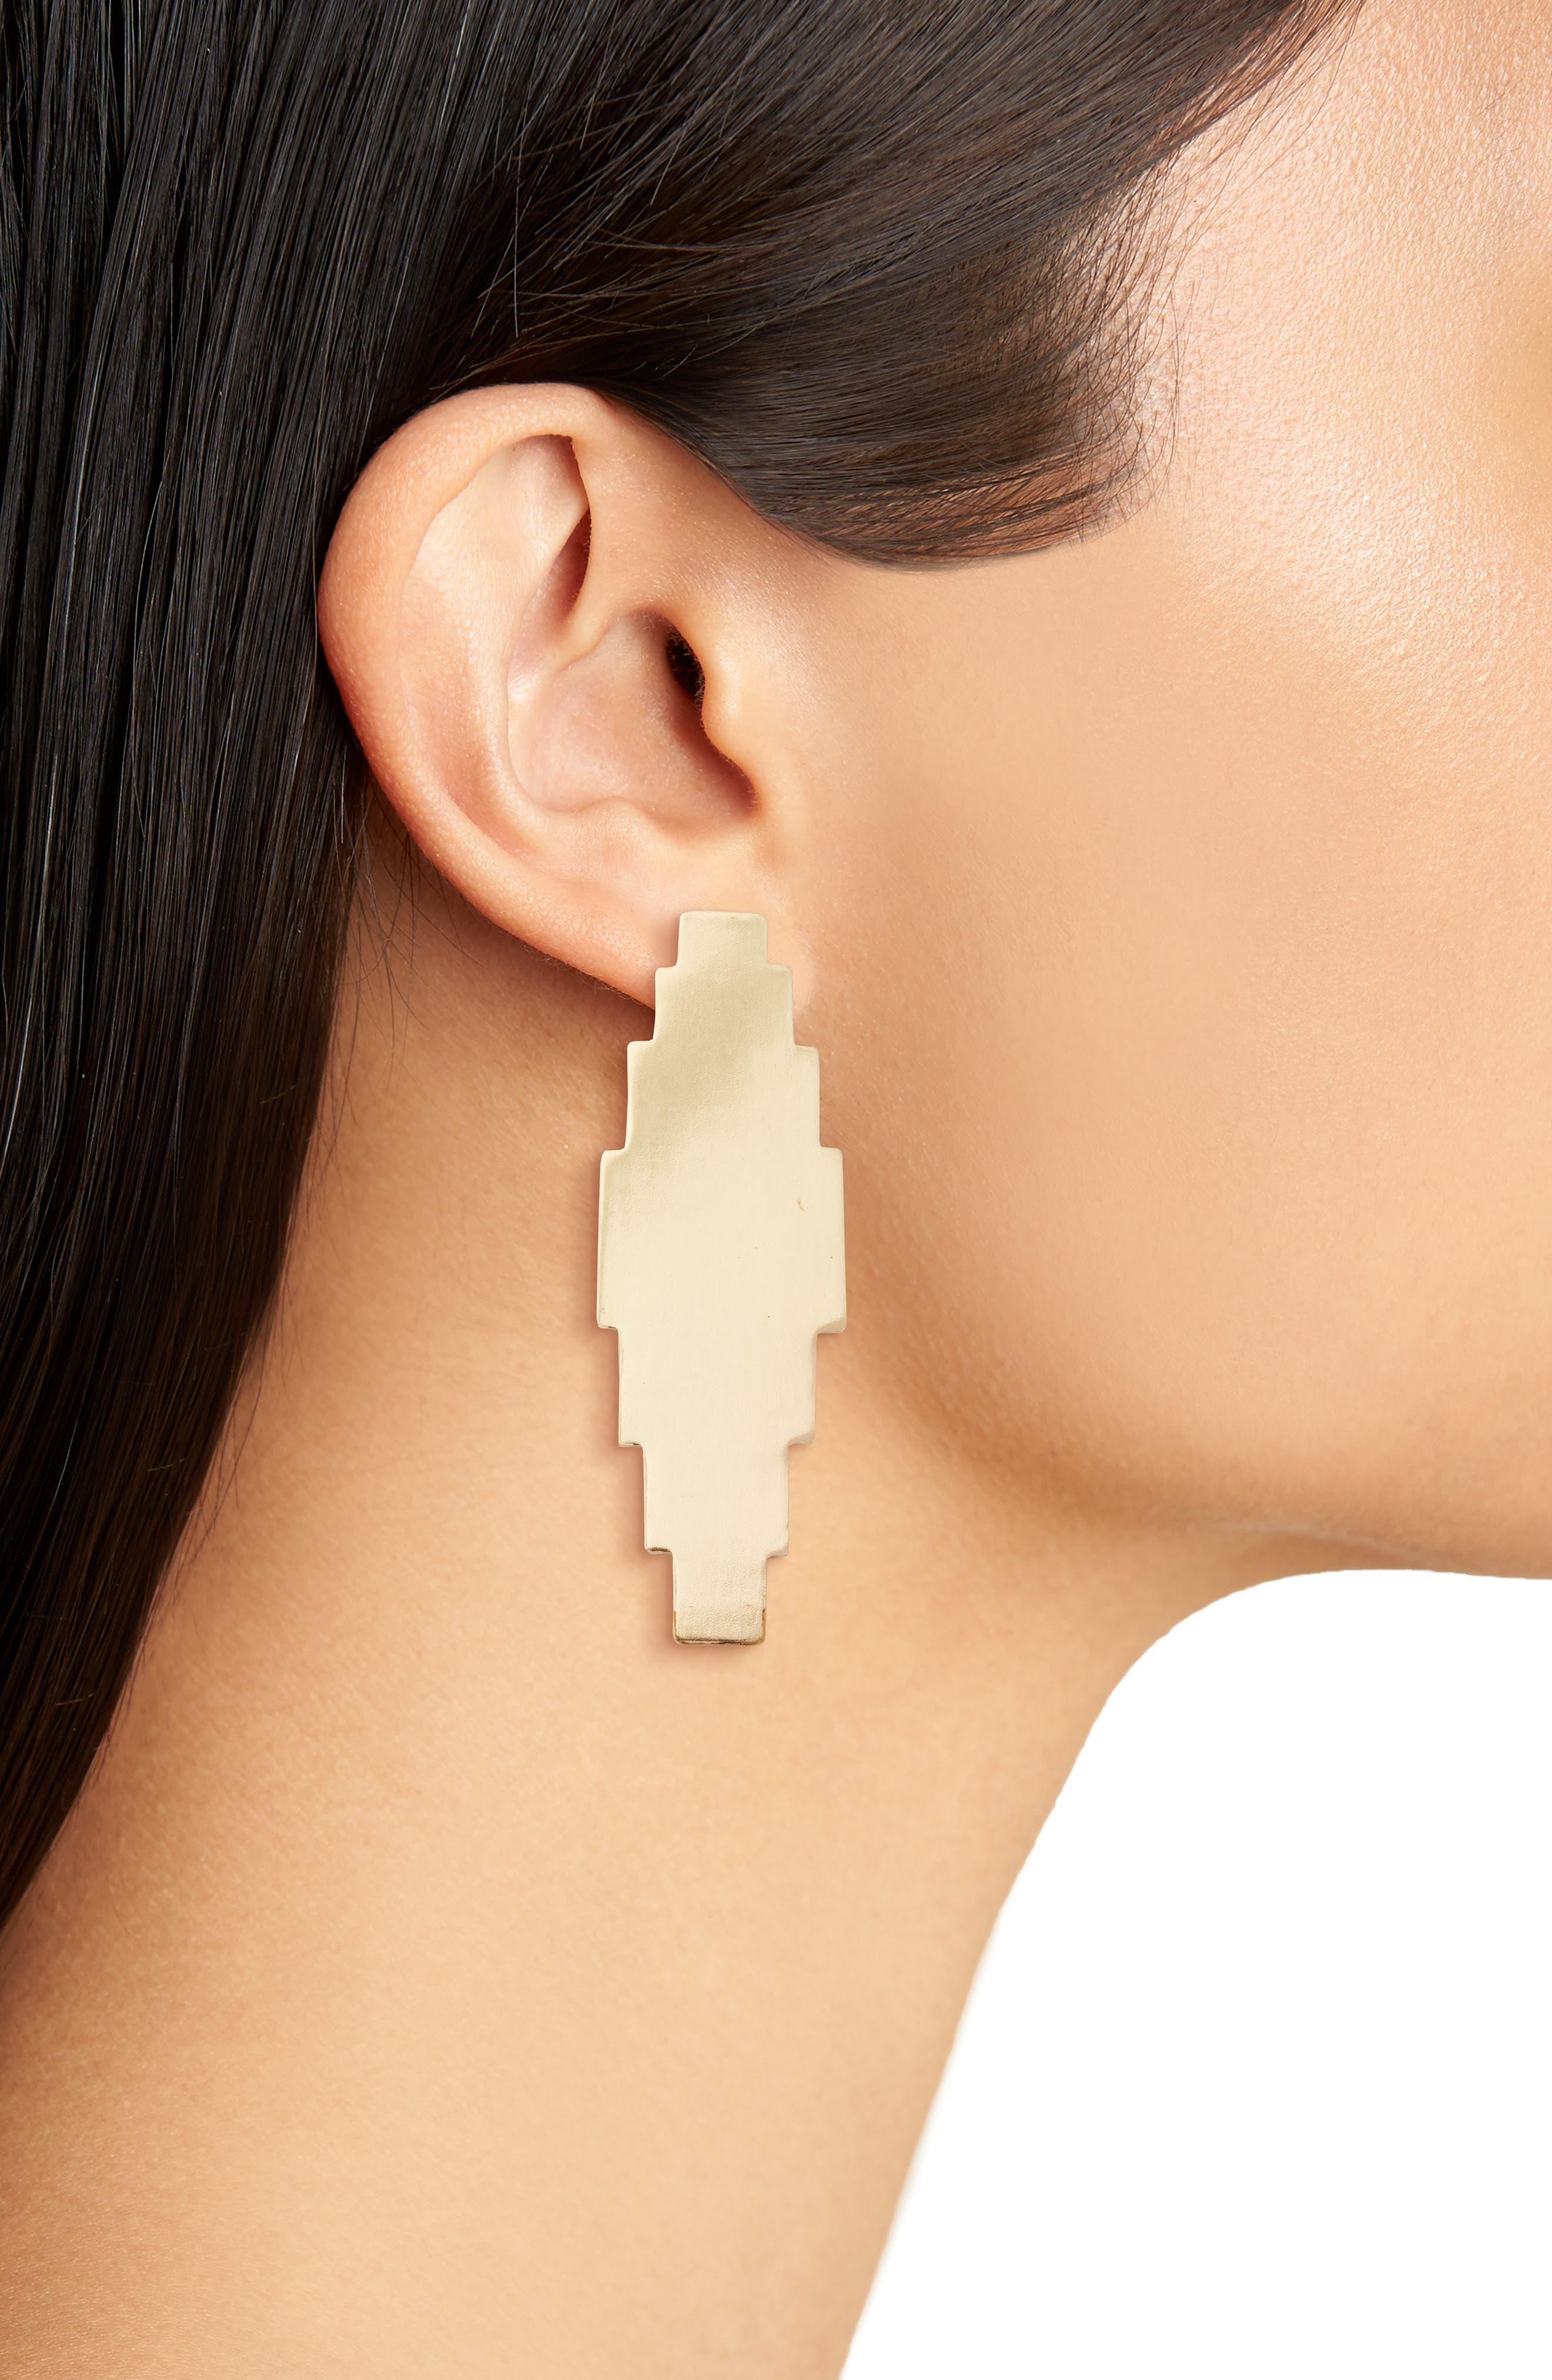 Elohi Post Earrings,                             Alternate thumbnail 2, color,                             710